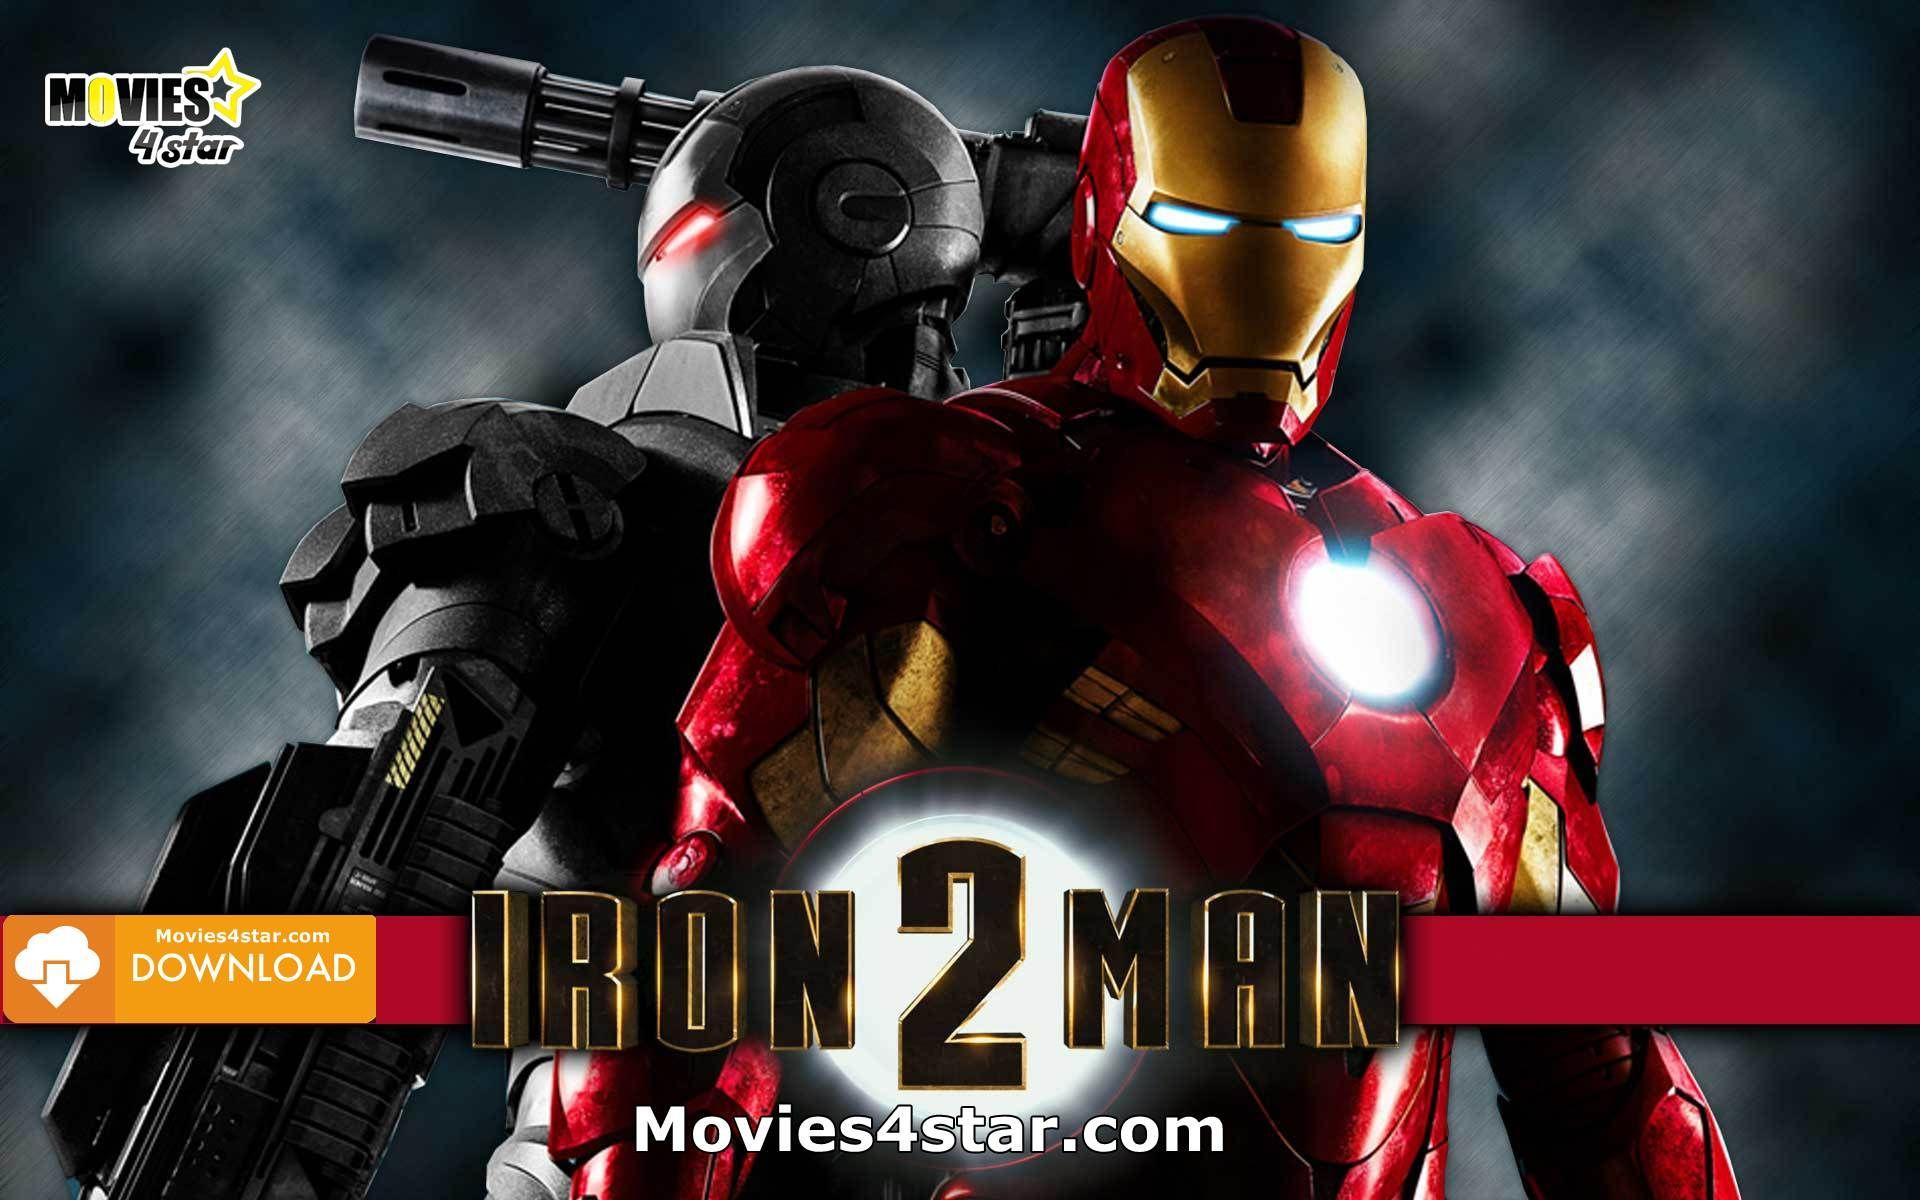 Iron Man 2 2010 Movie Hdrip 720p Free Online Download From Movies4star Get 2017 Movies Collection And Traje De Iron Man Ironman Fondo De Pantalla De Iron Man